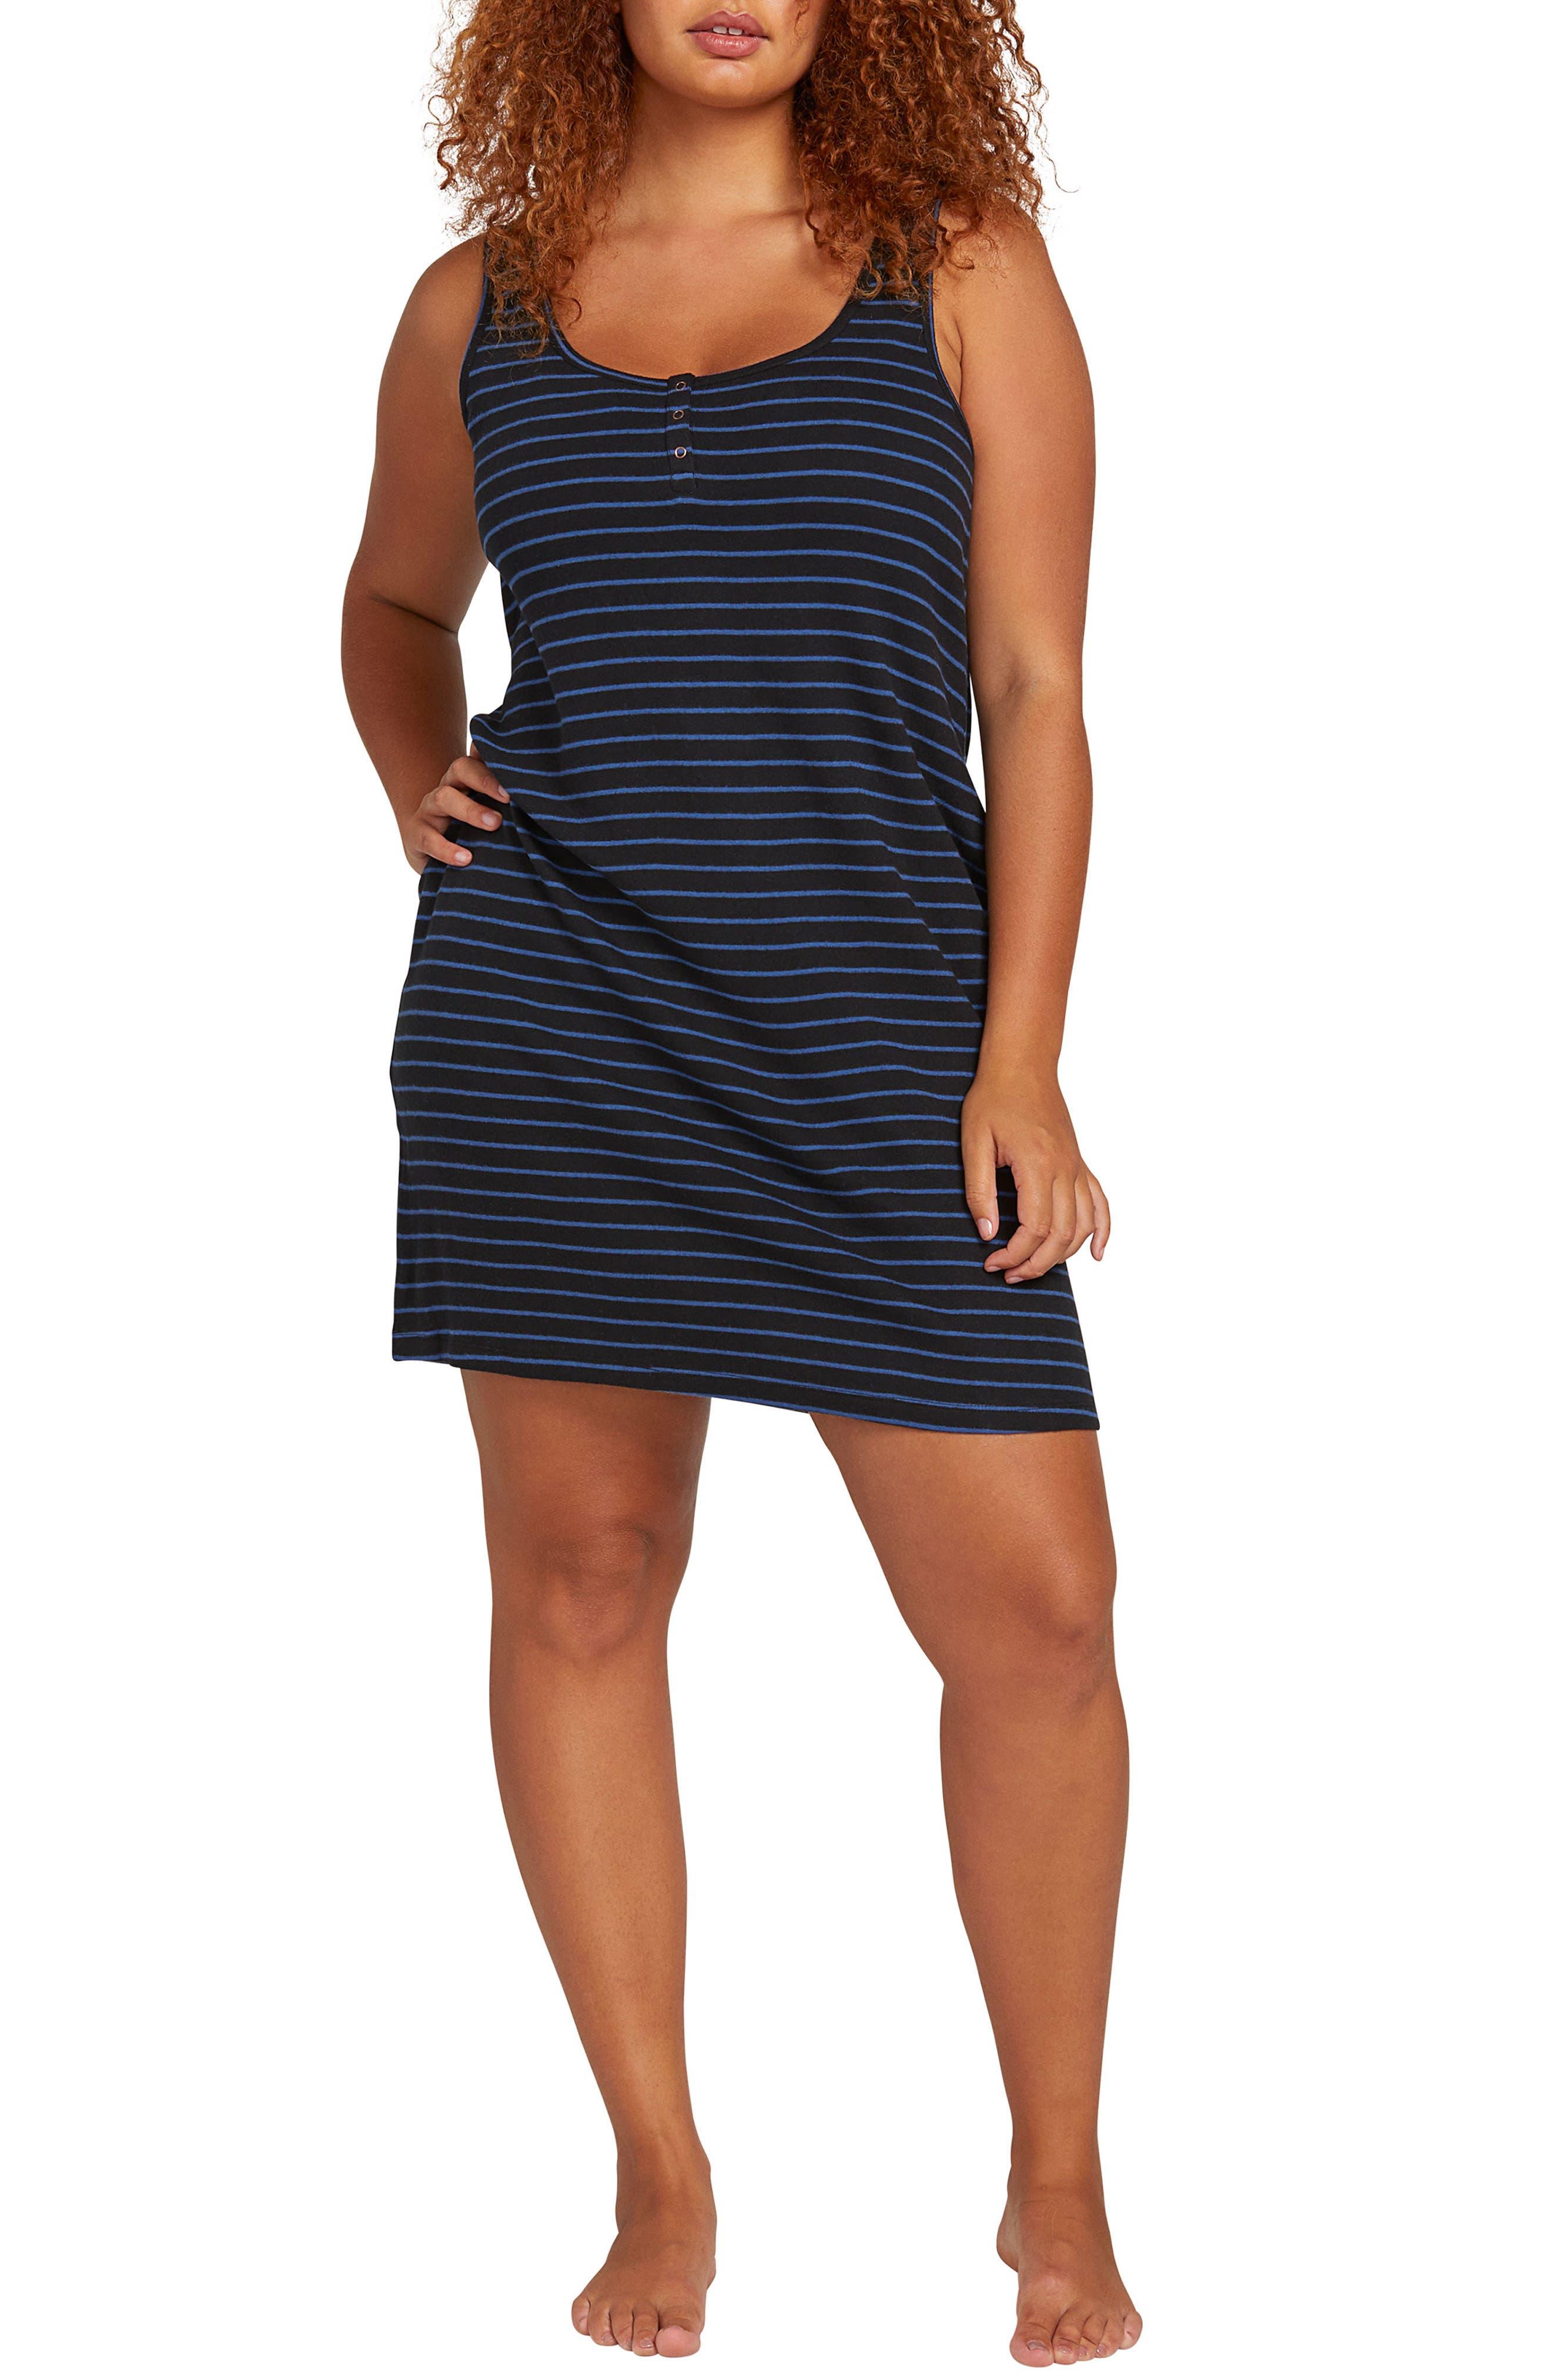 Plus Size Volcom Lil Stripe Minidress, Black